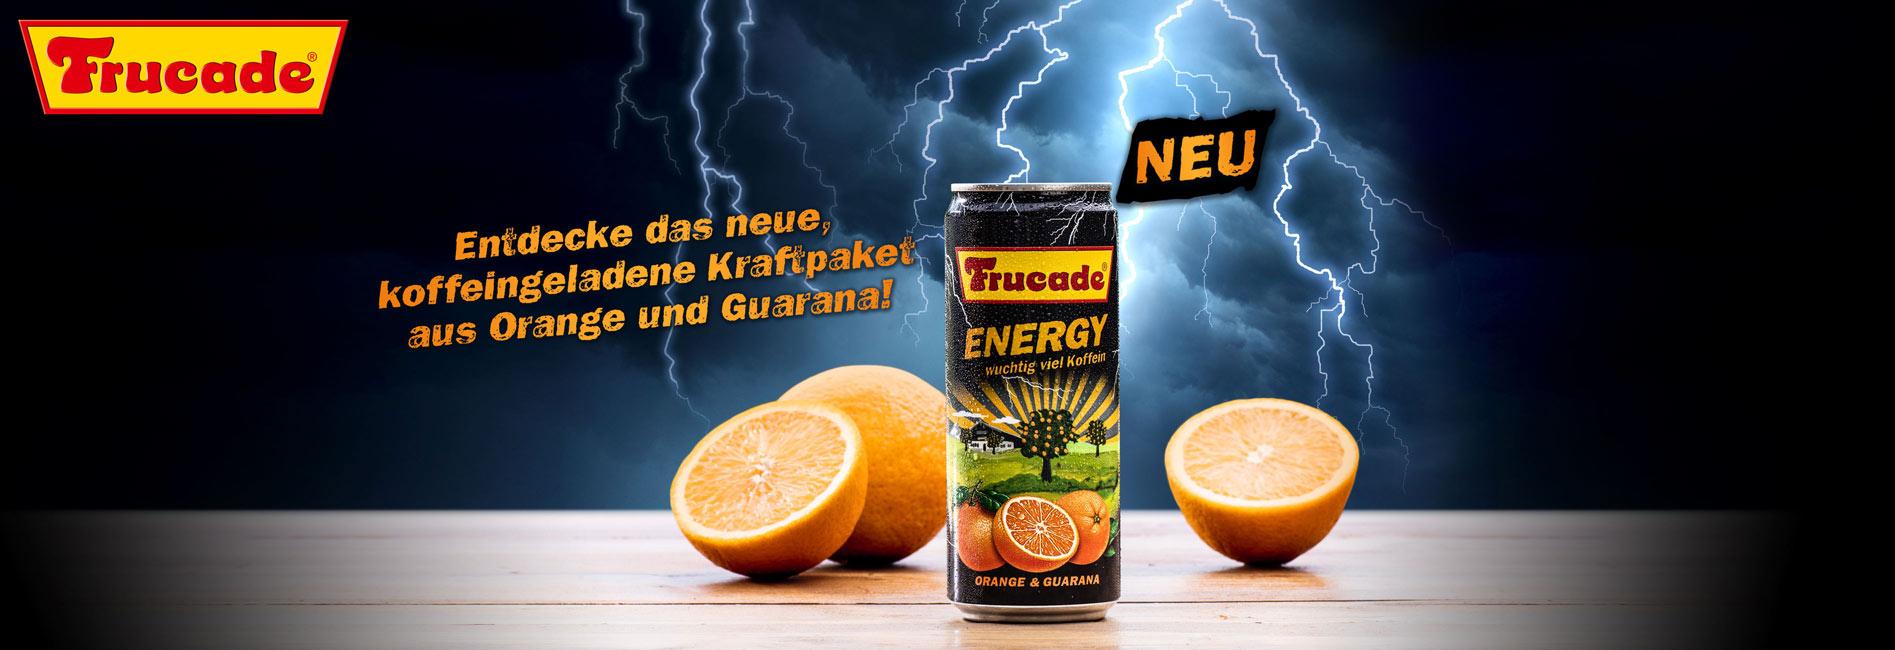 ENERGY kickt Orange!